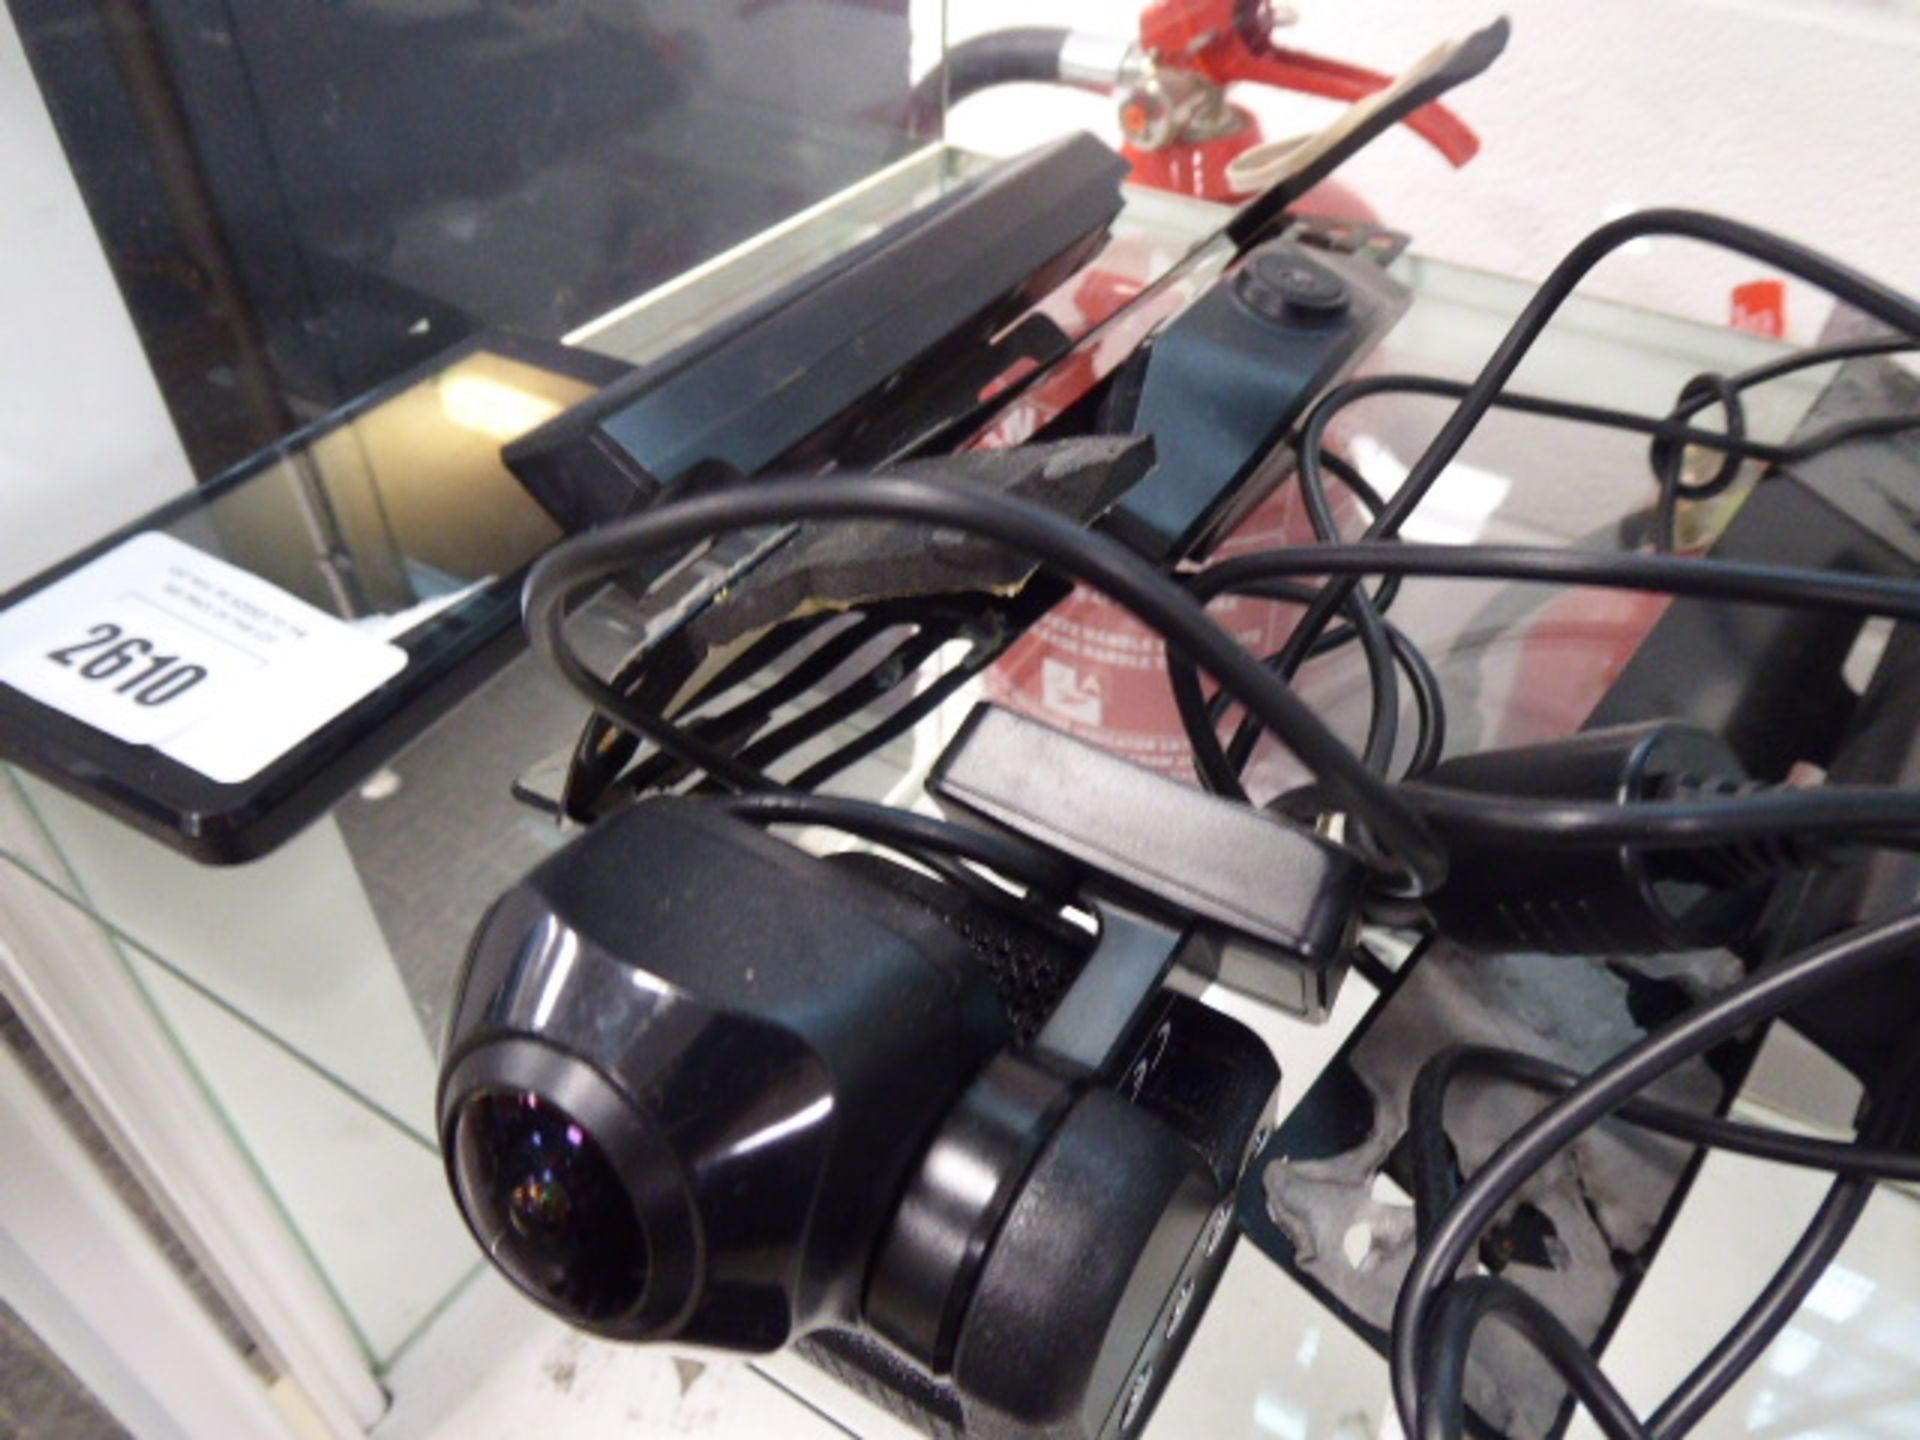 Part set of dash cam reversing camera kits - Image 2 of 3